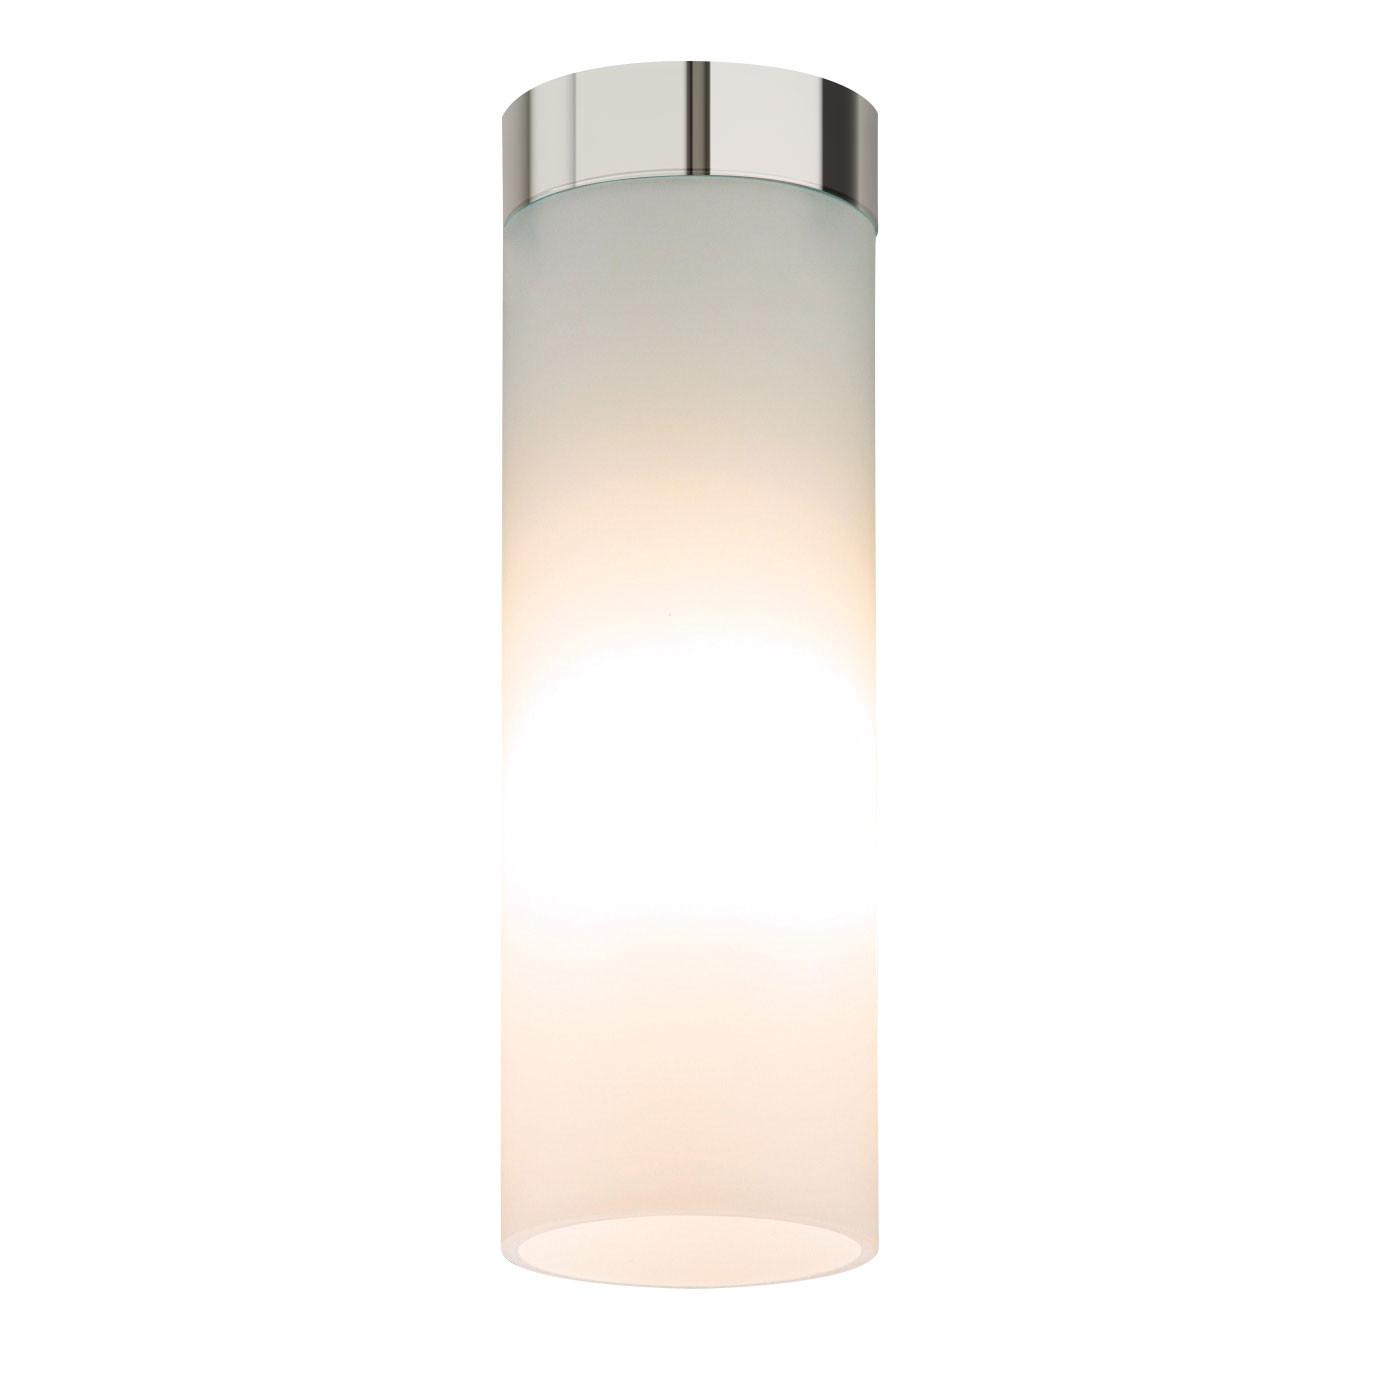 Top Light Dela Box ceiling lamp